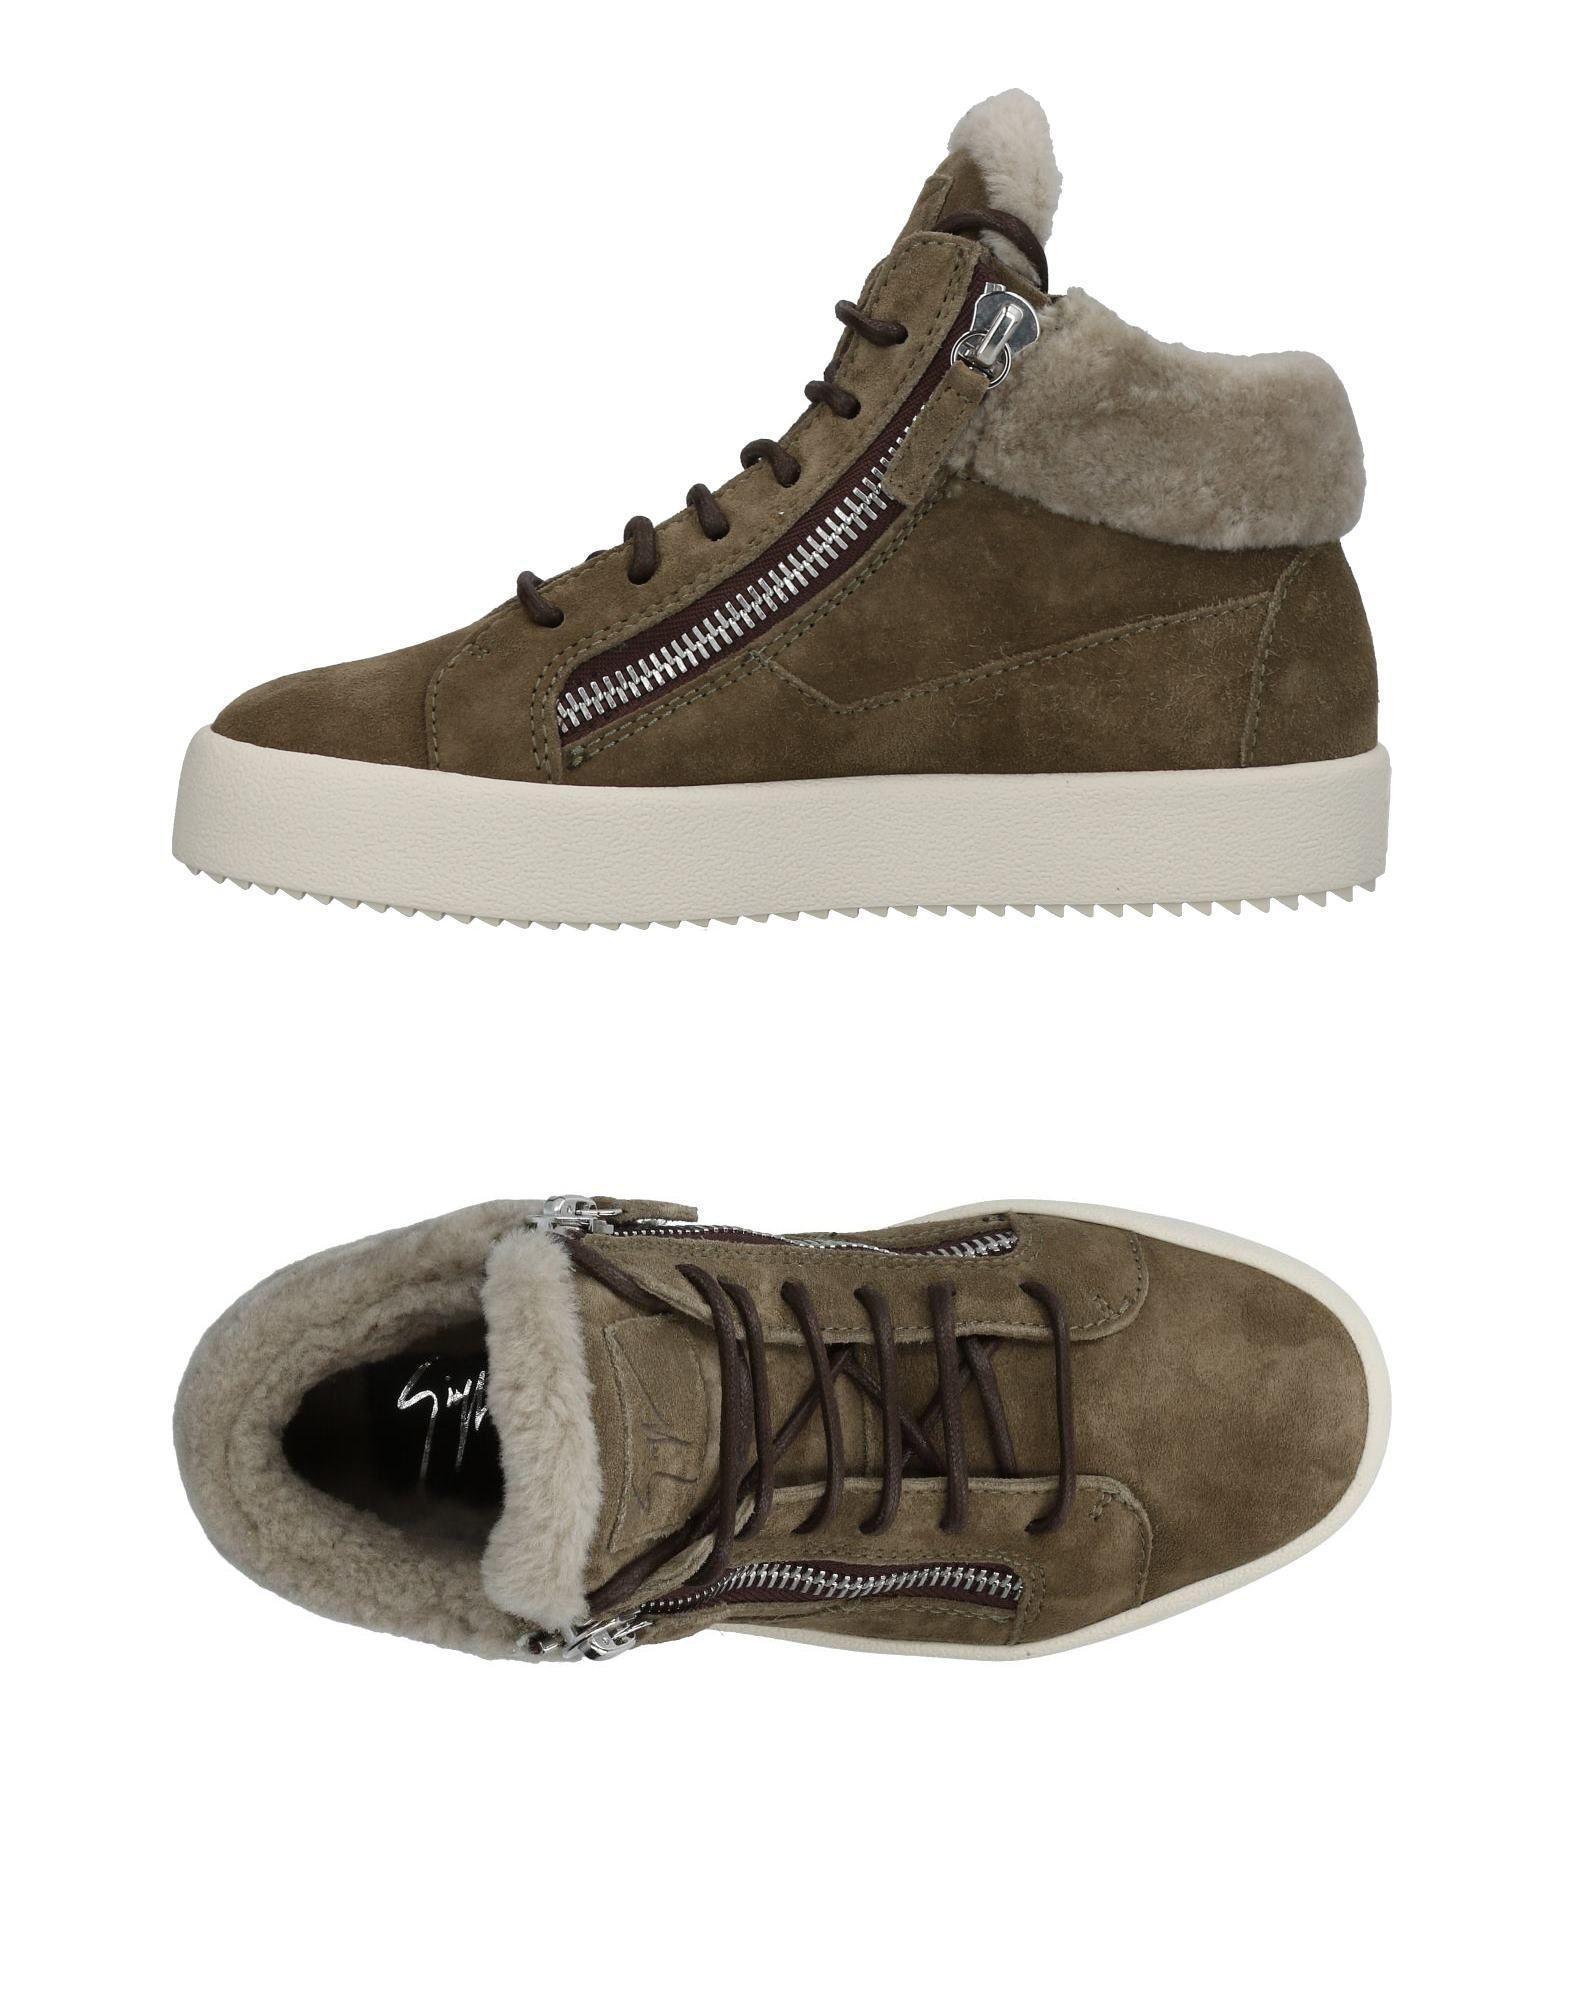 c0f2a2e192137 Giuseppe Zanotti Sneakers In Military Green | ModeSens